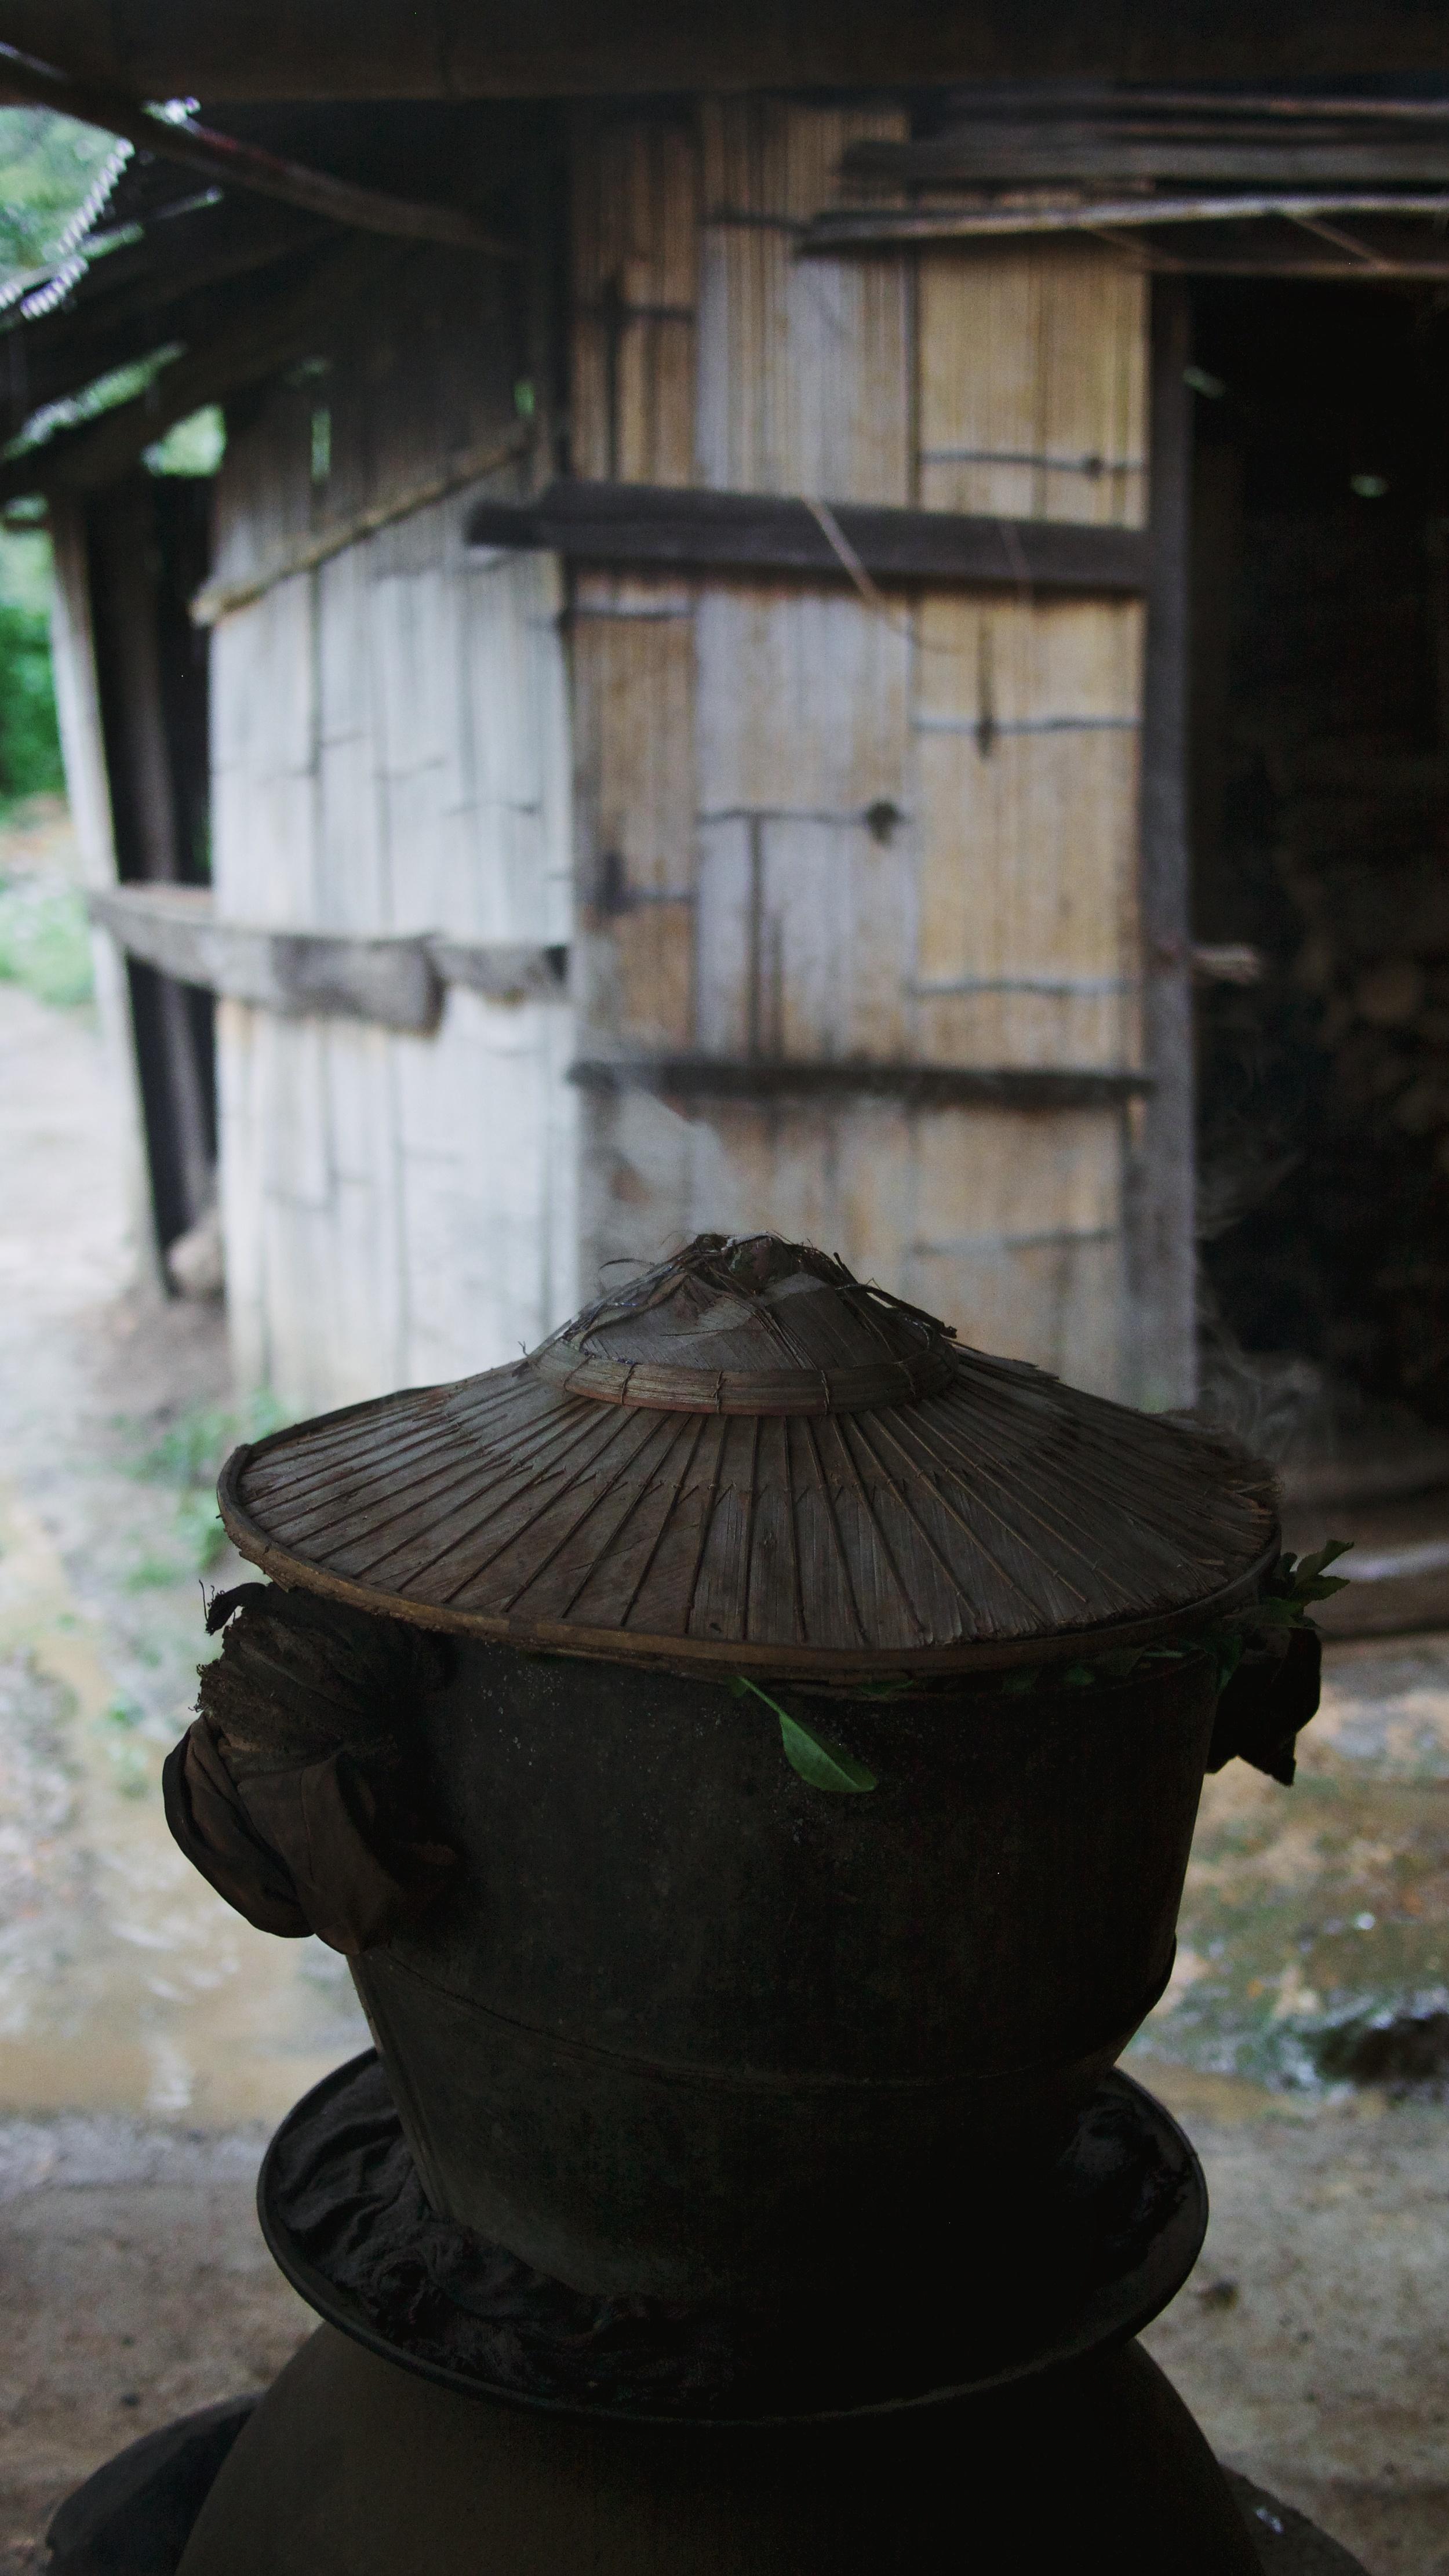 Tea-leaf steaming contraption